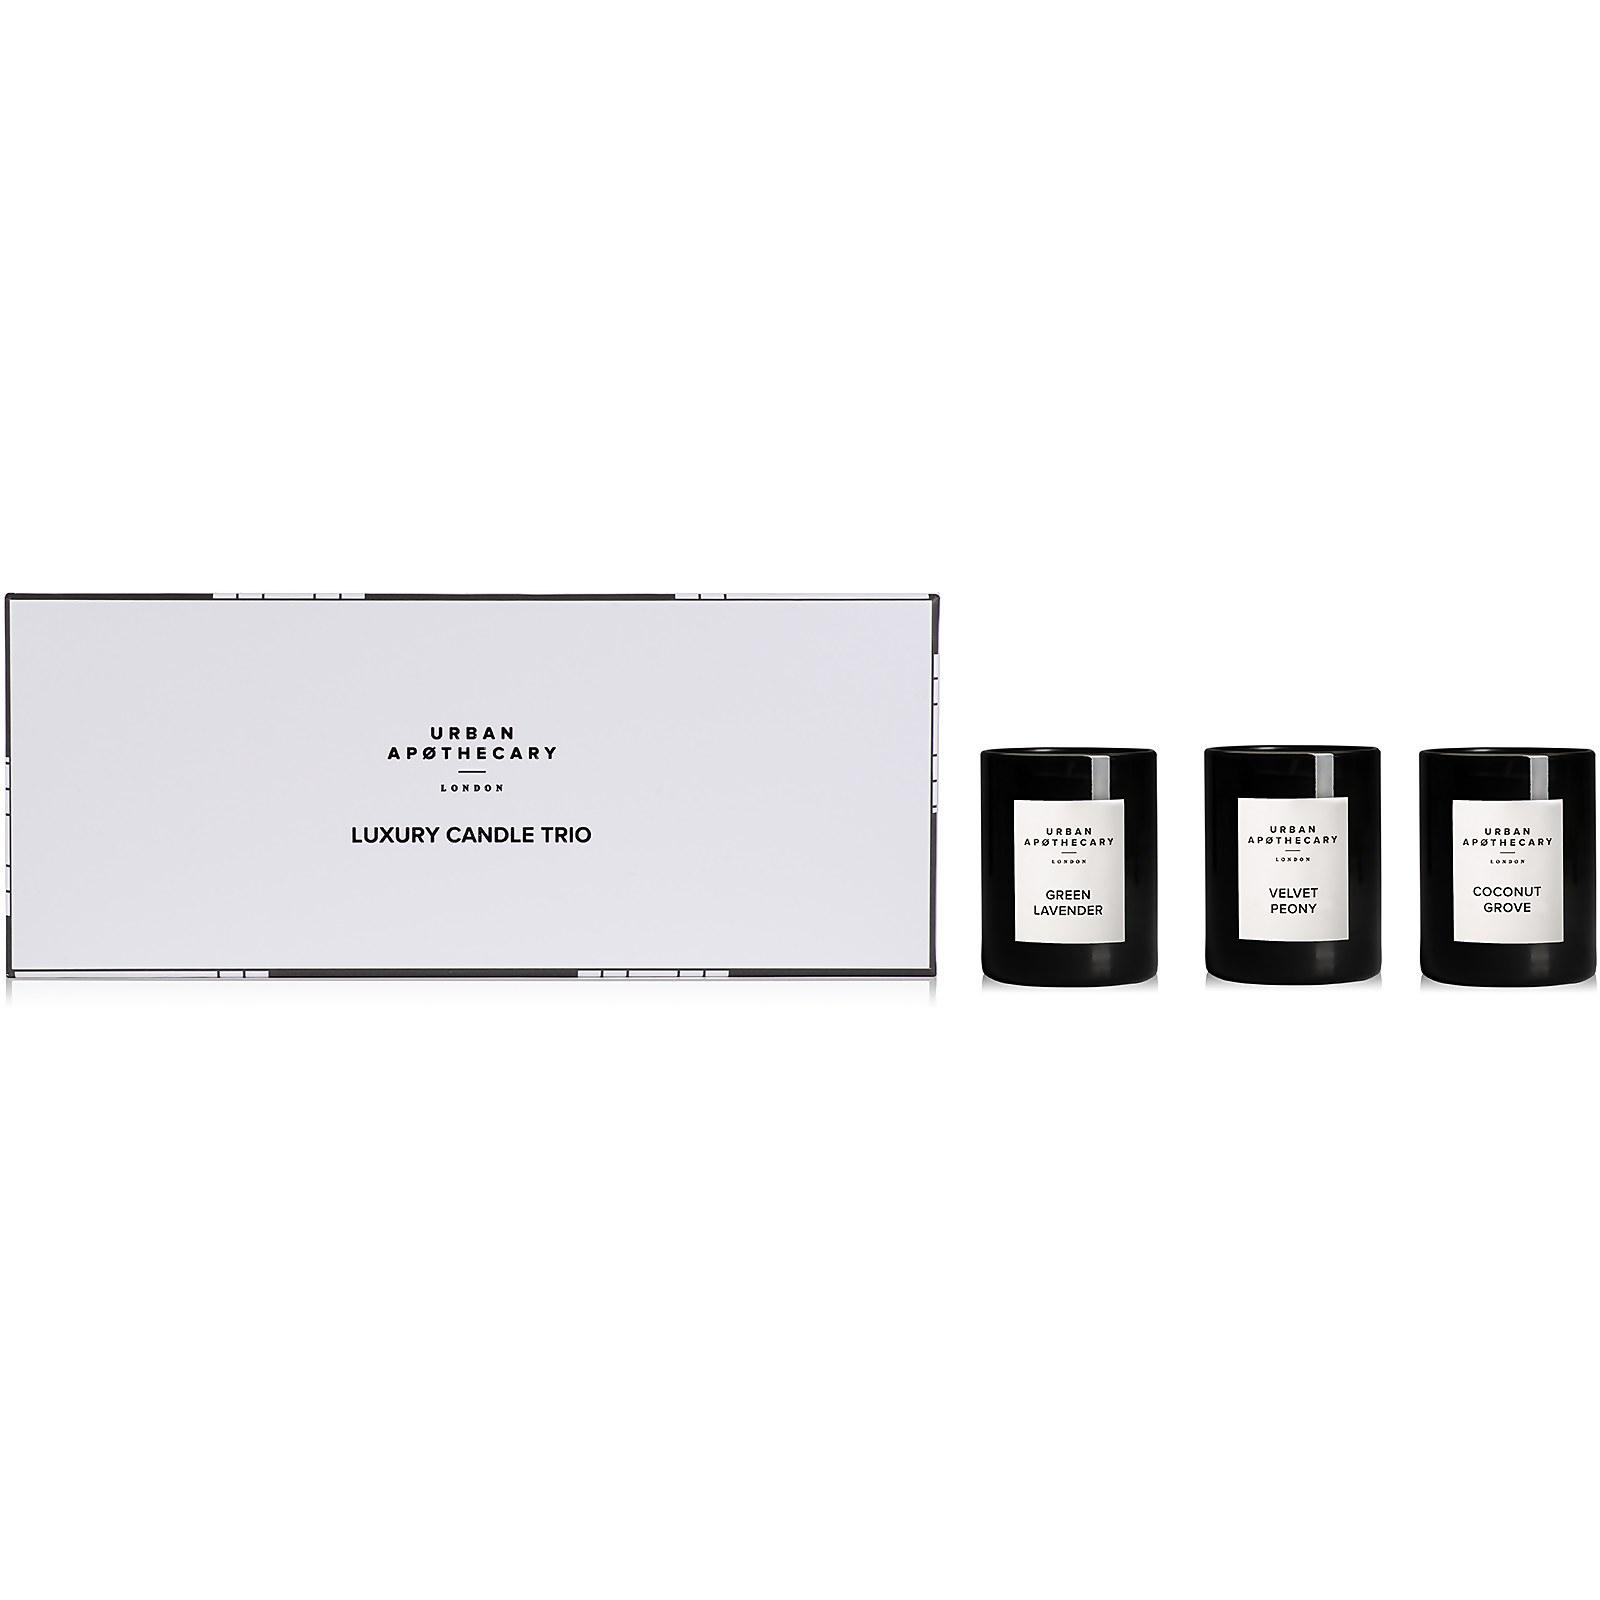 Urban Apothecary Luxury Candle Trio Gift Set - Green Lavender - 70g